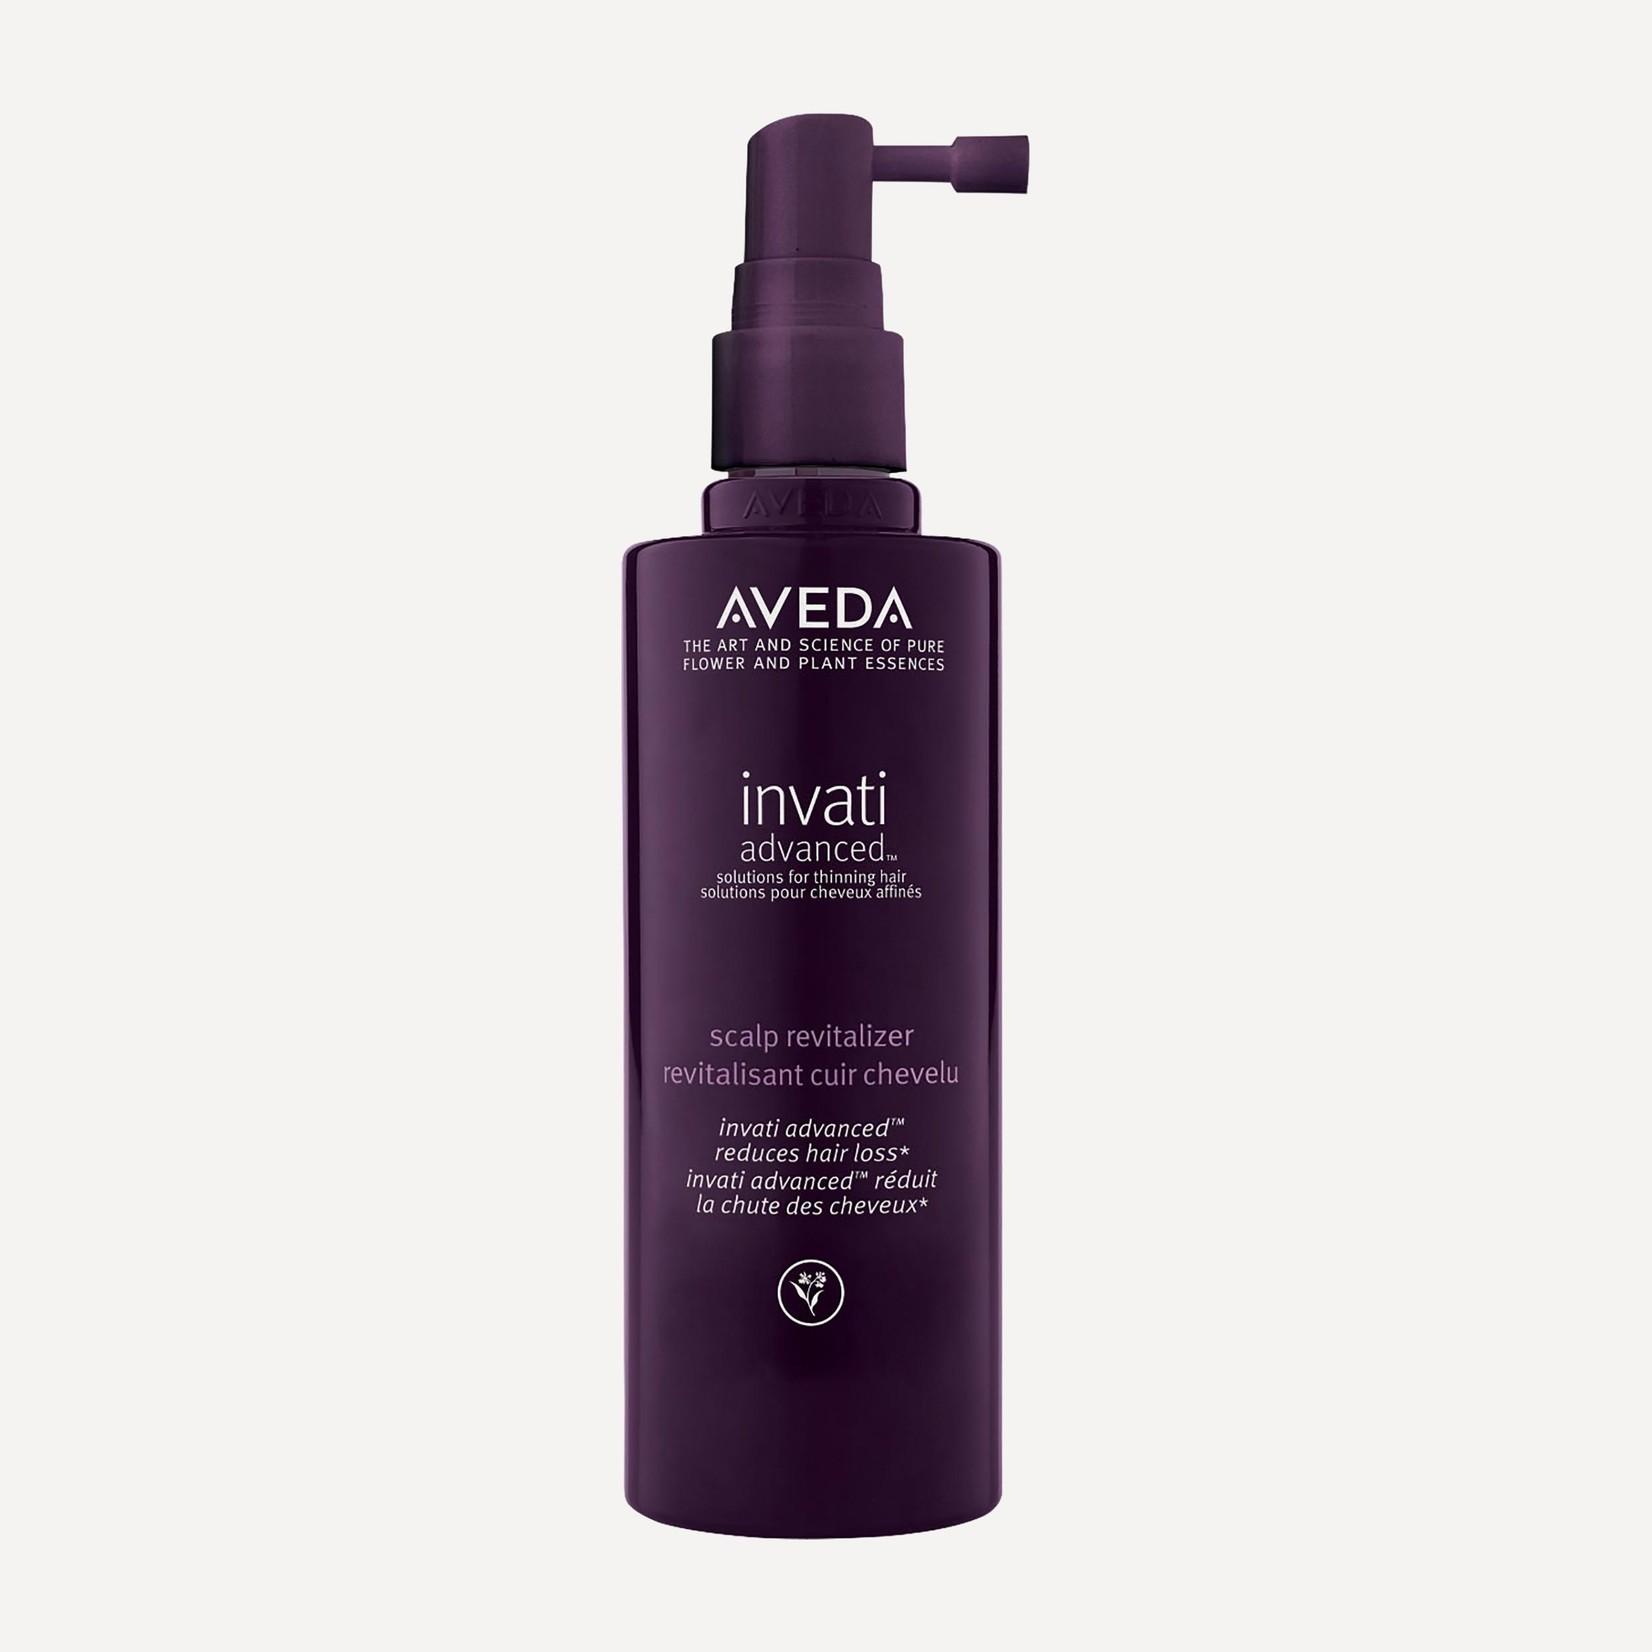 AVEDA Invati Advanced™ Scalp Revitalizer